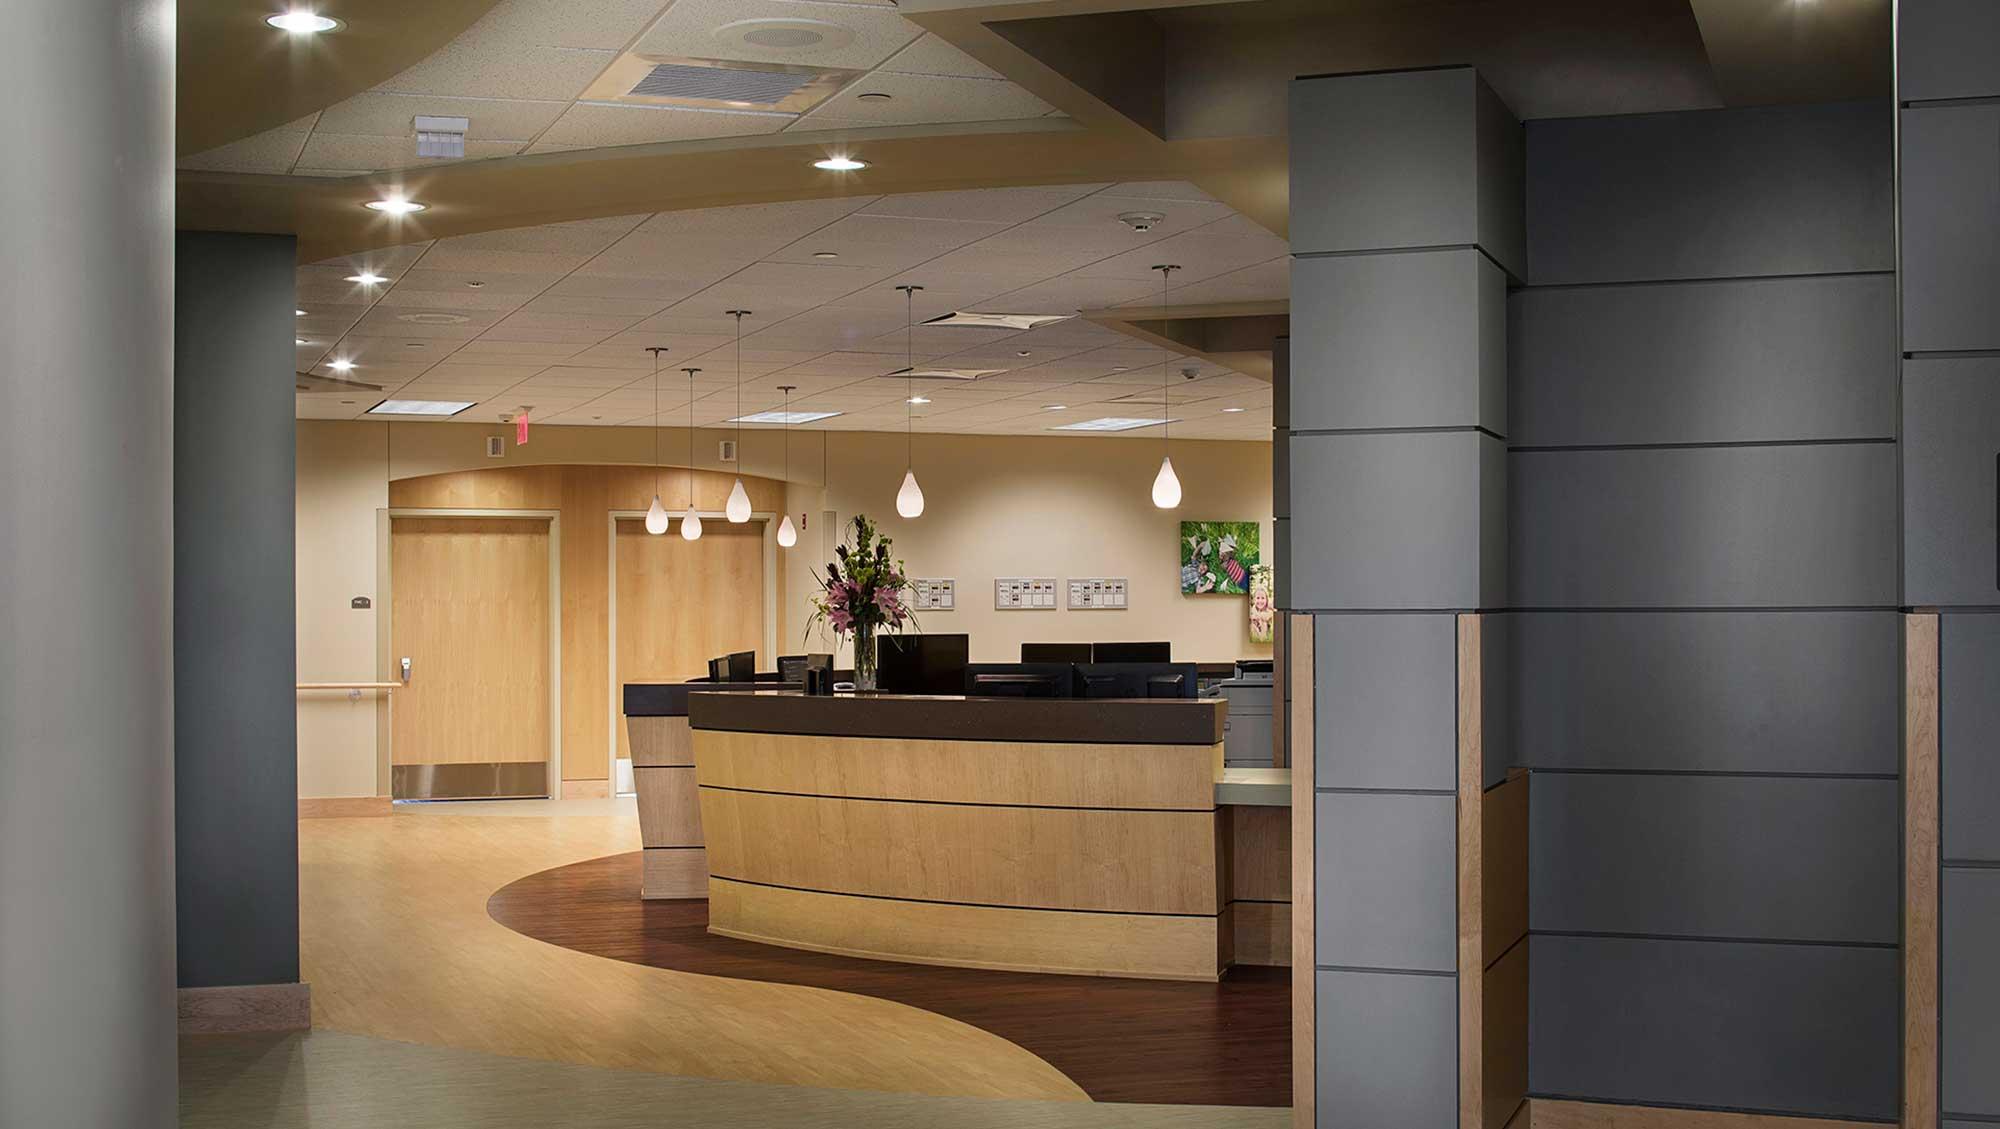 St. Patrick Hospital, Family Maternity Center